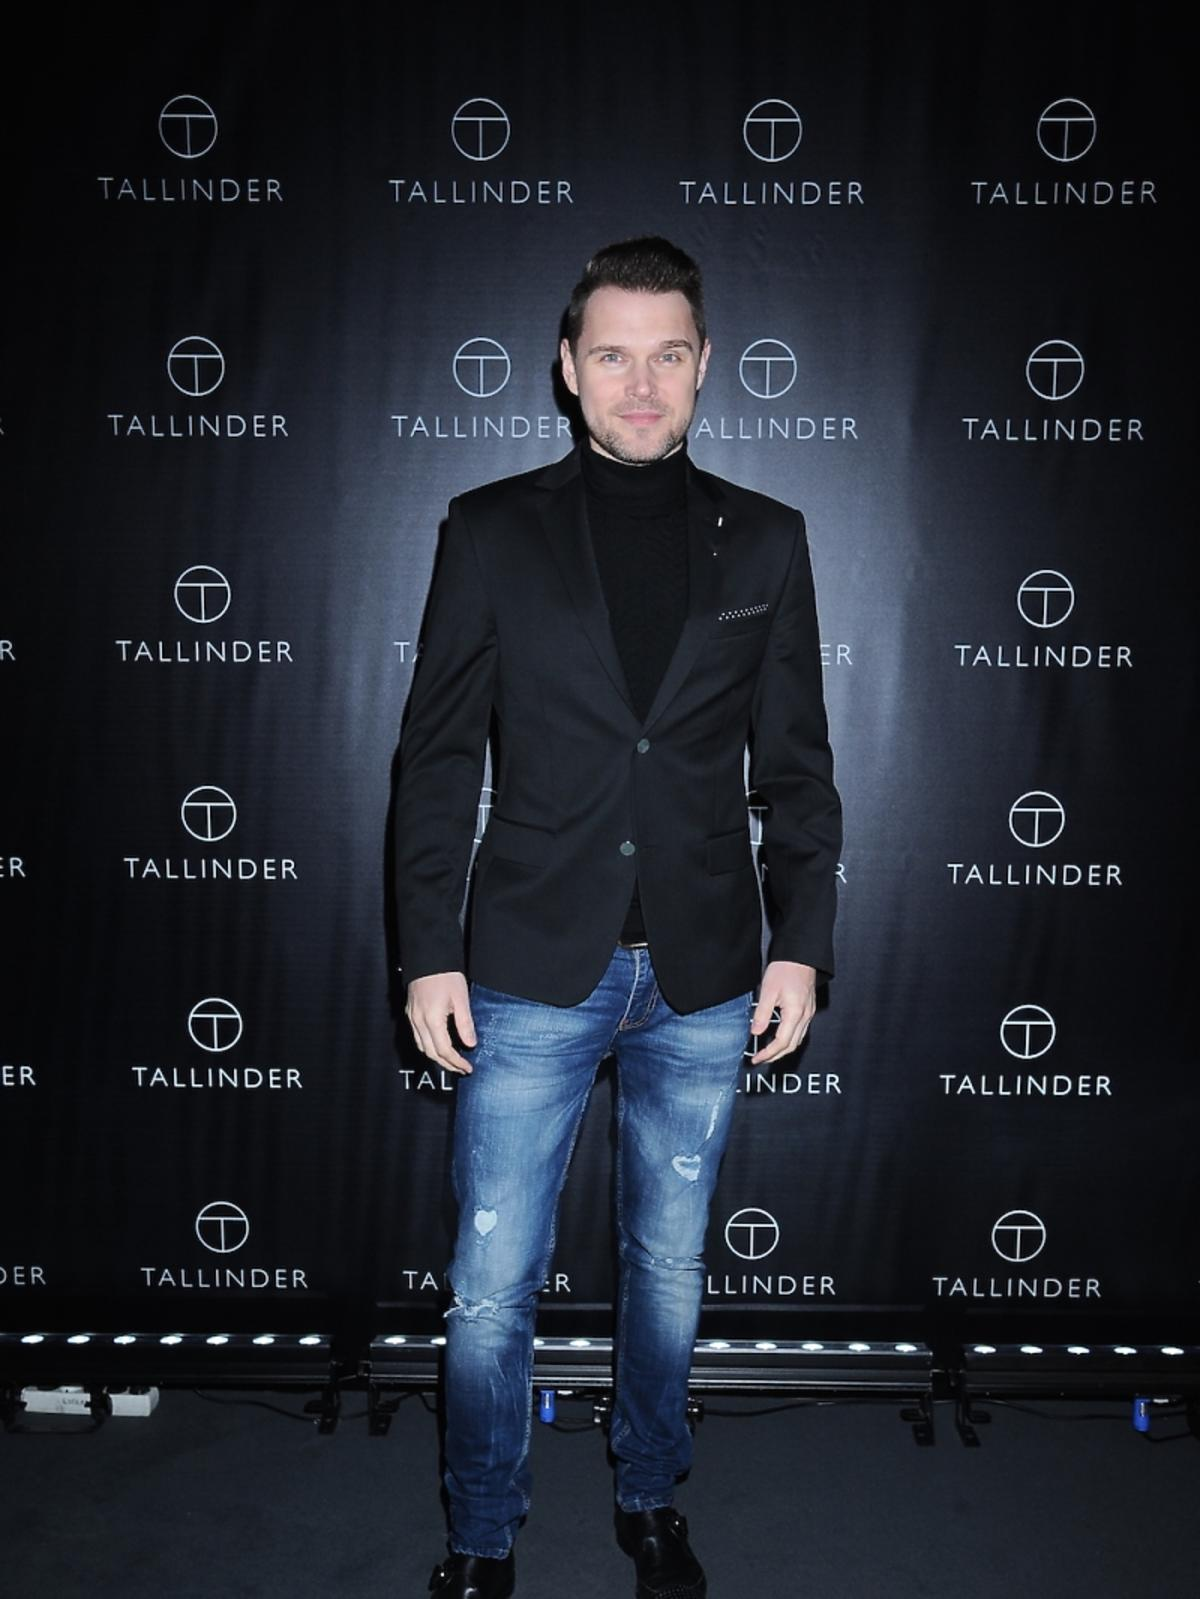 Marek Kaliszuk na prezentacji marki Tallinder